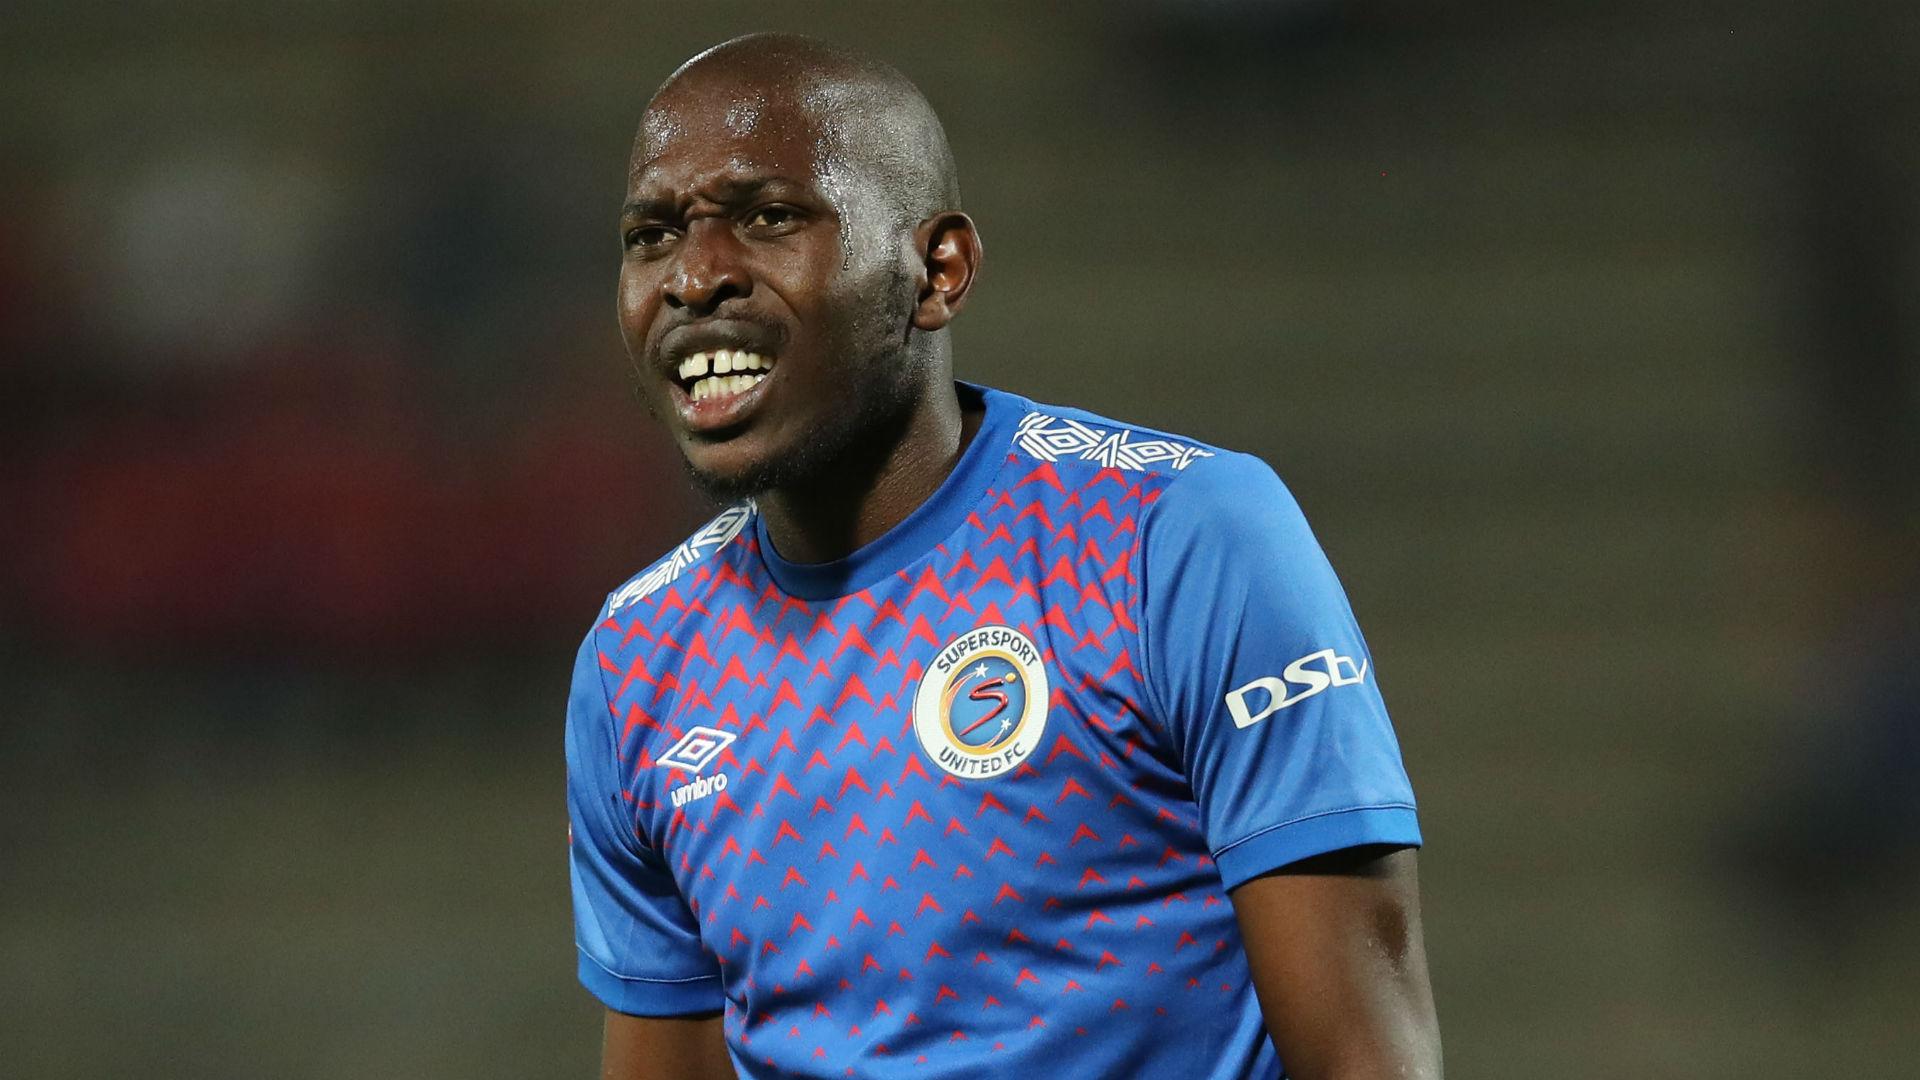 Modiba: SuperSport United announce midfielder's move to Mamelodi Sundowns